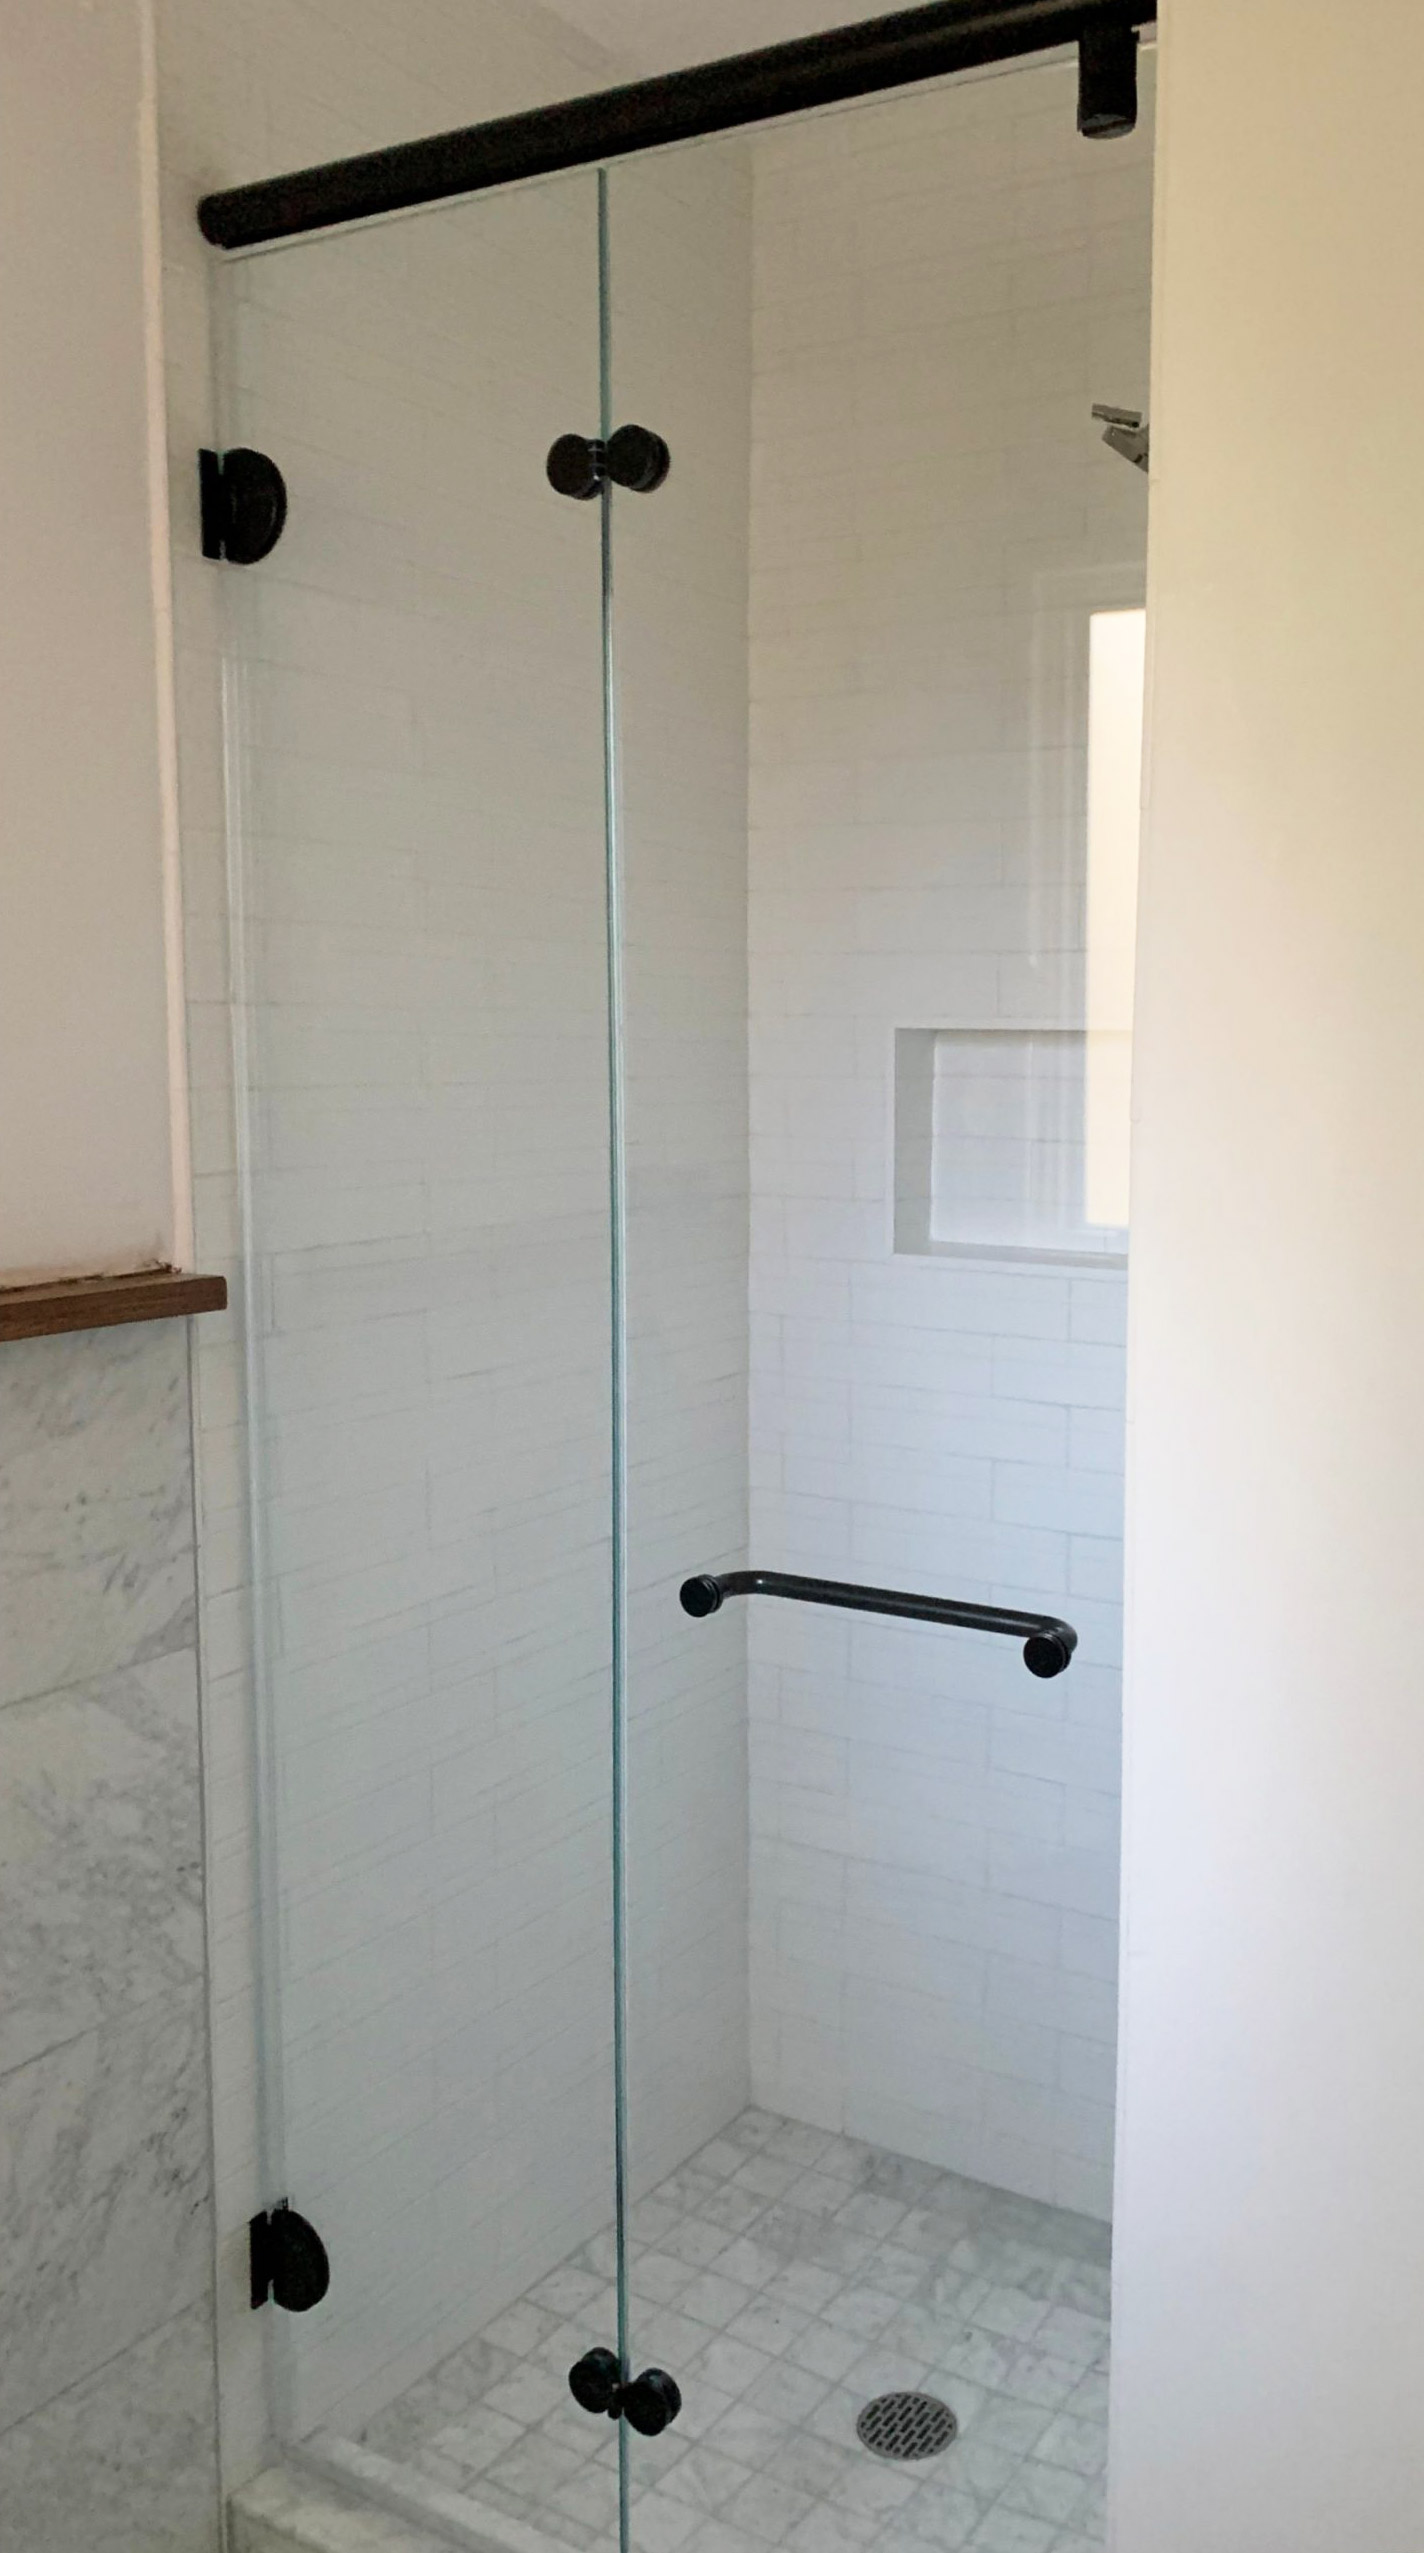 Shower Enclosure with Matte Black Powder Coating